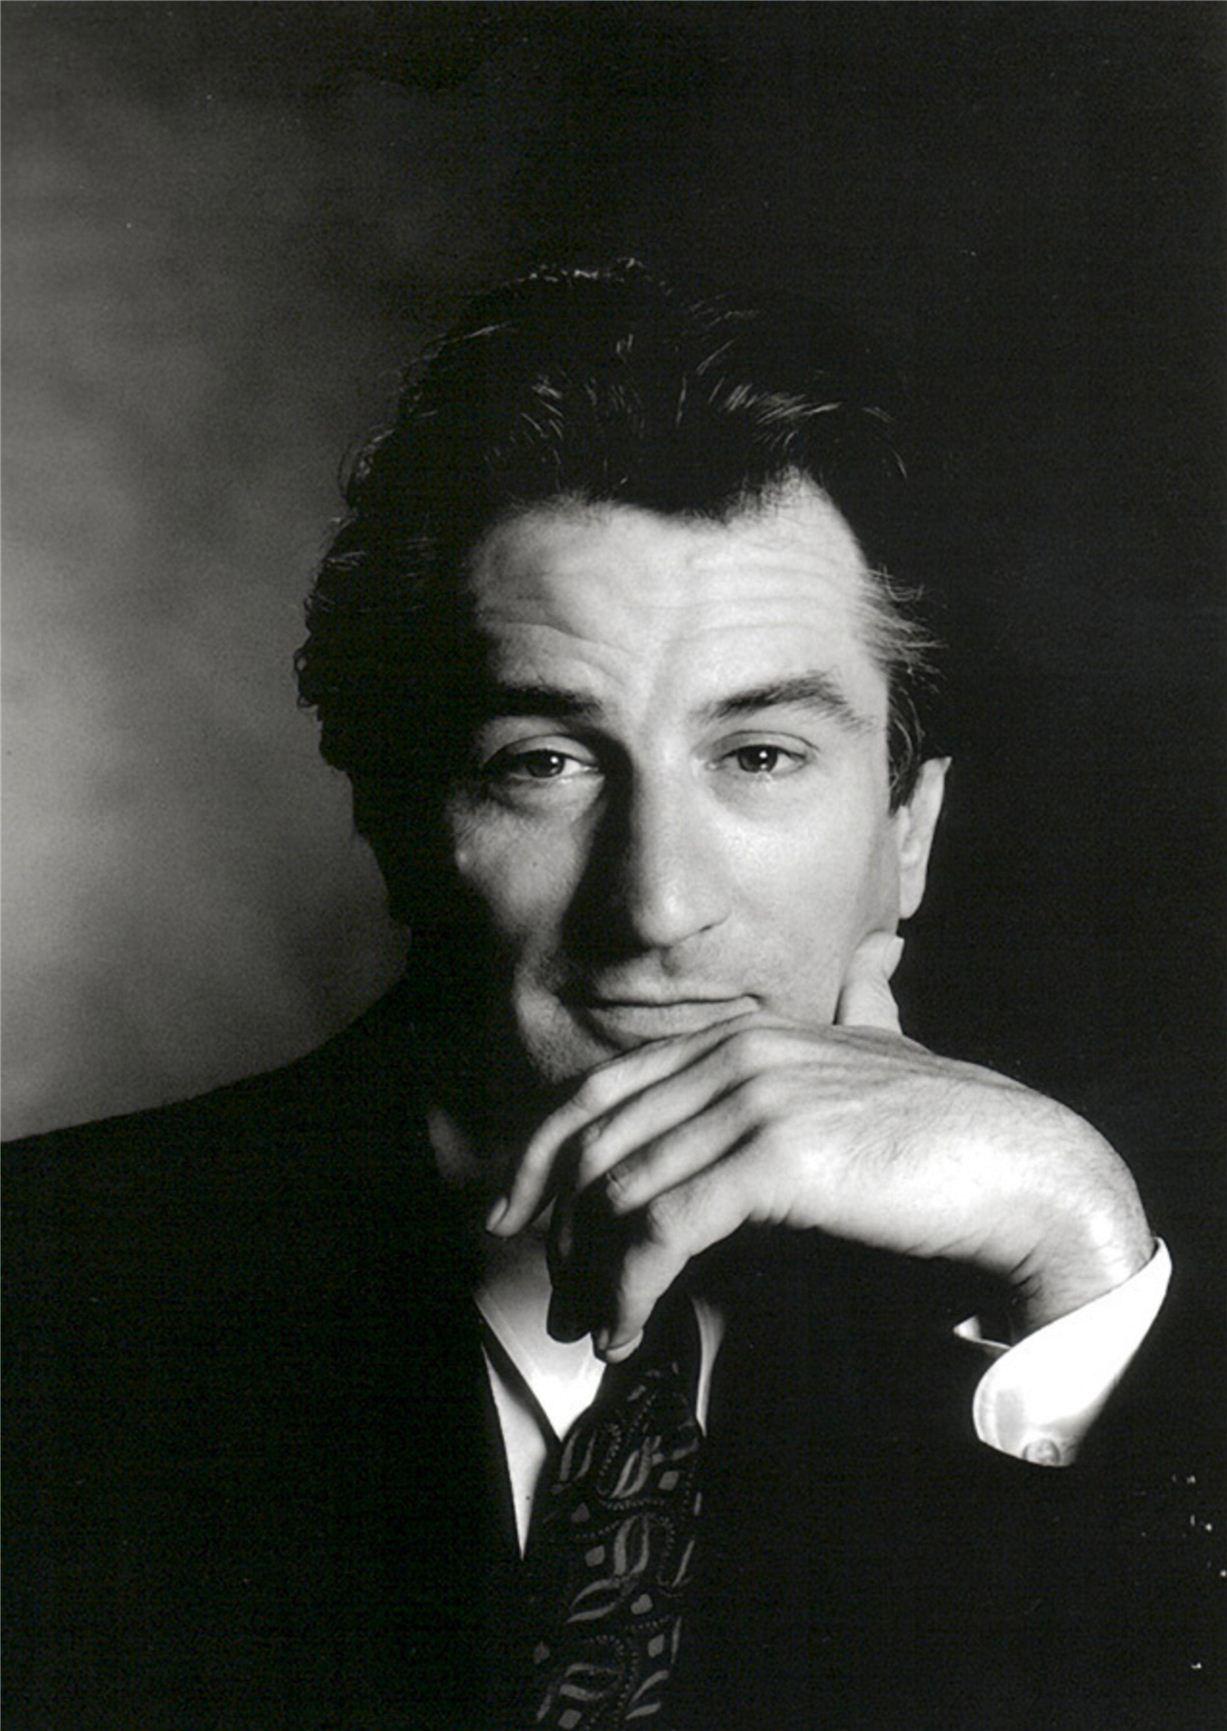 Robert De Niro / Роберт де Ниро - портрет фотографа Грега Гормана / Greg Gorman